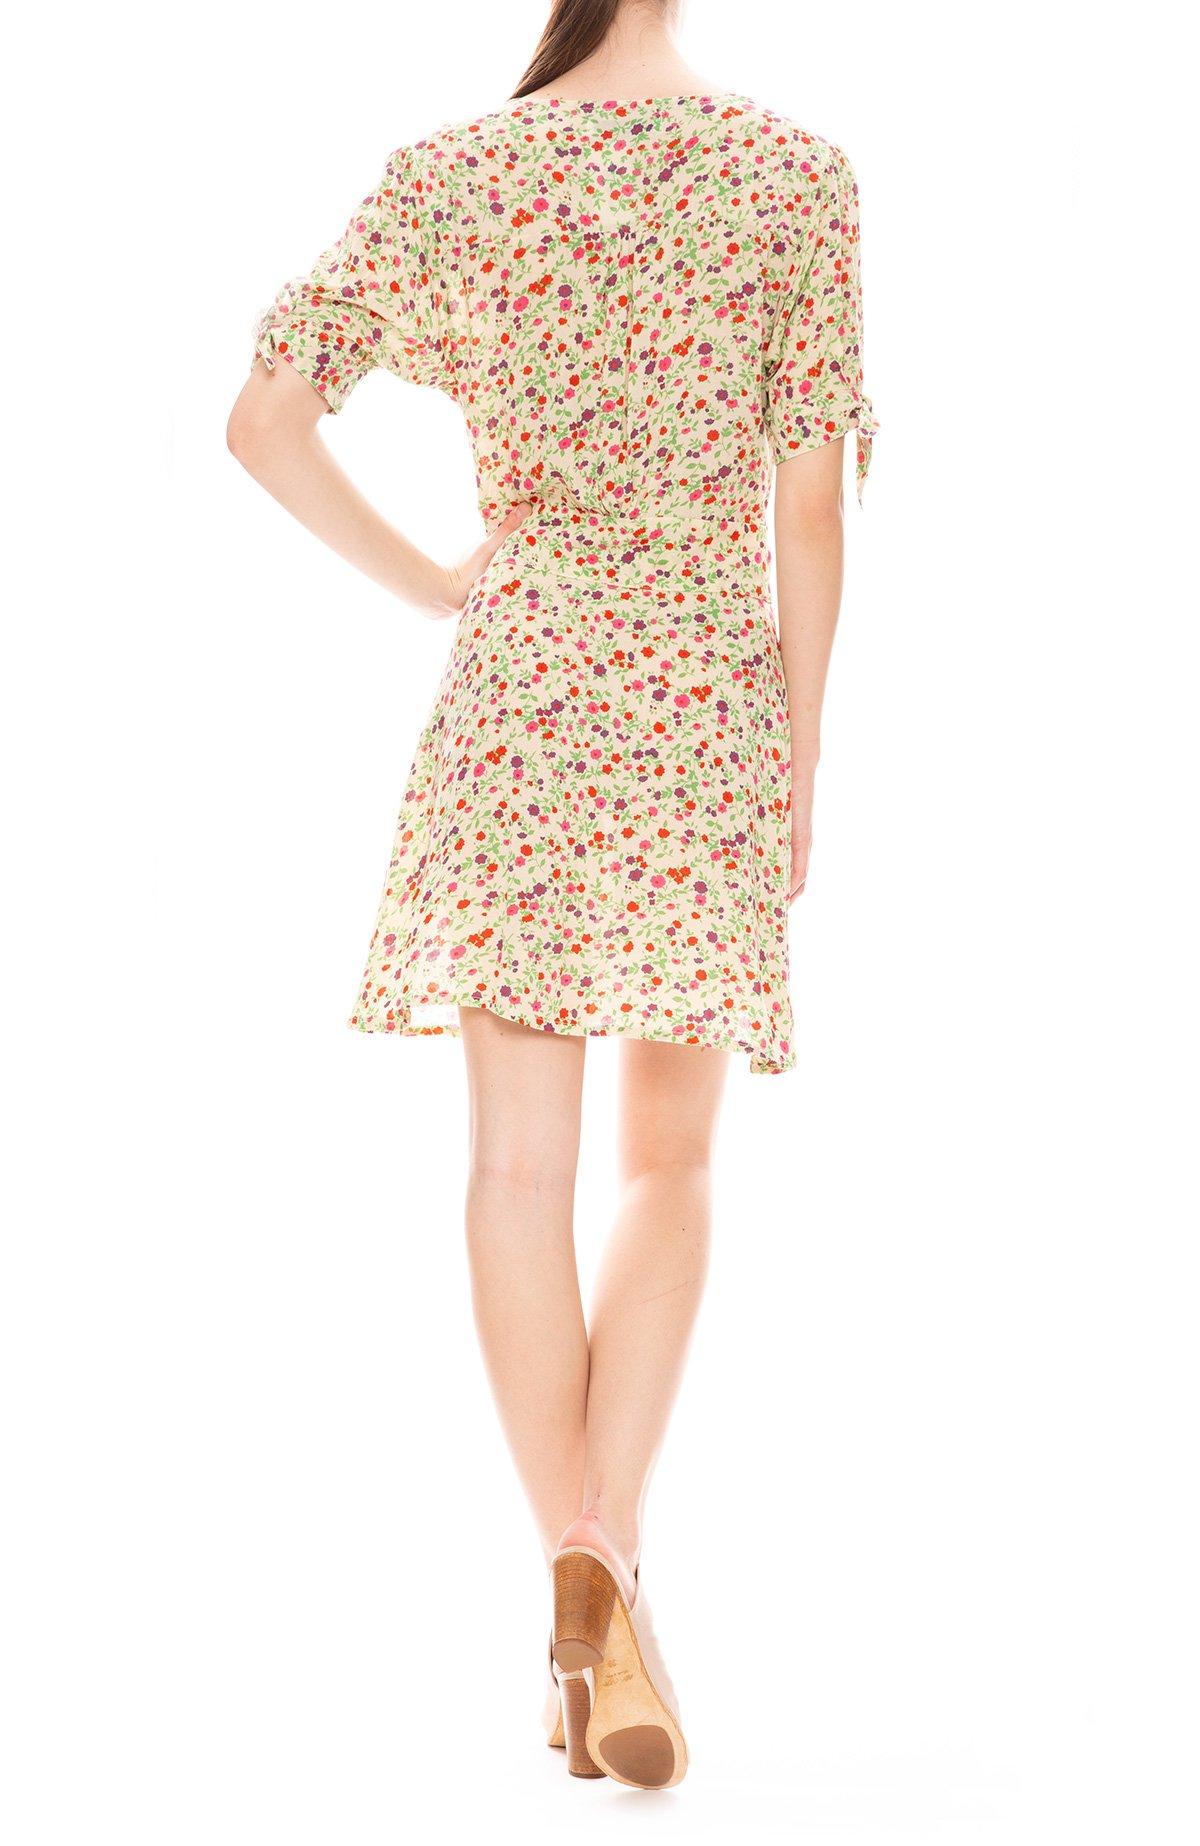 The Bastille Dress – Miss Temby  |Bastille Dress